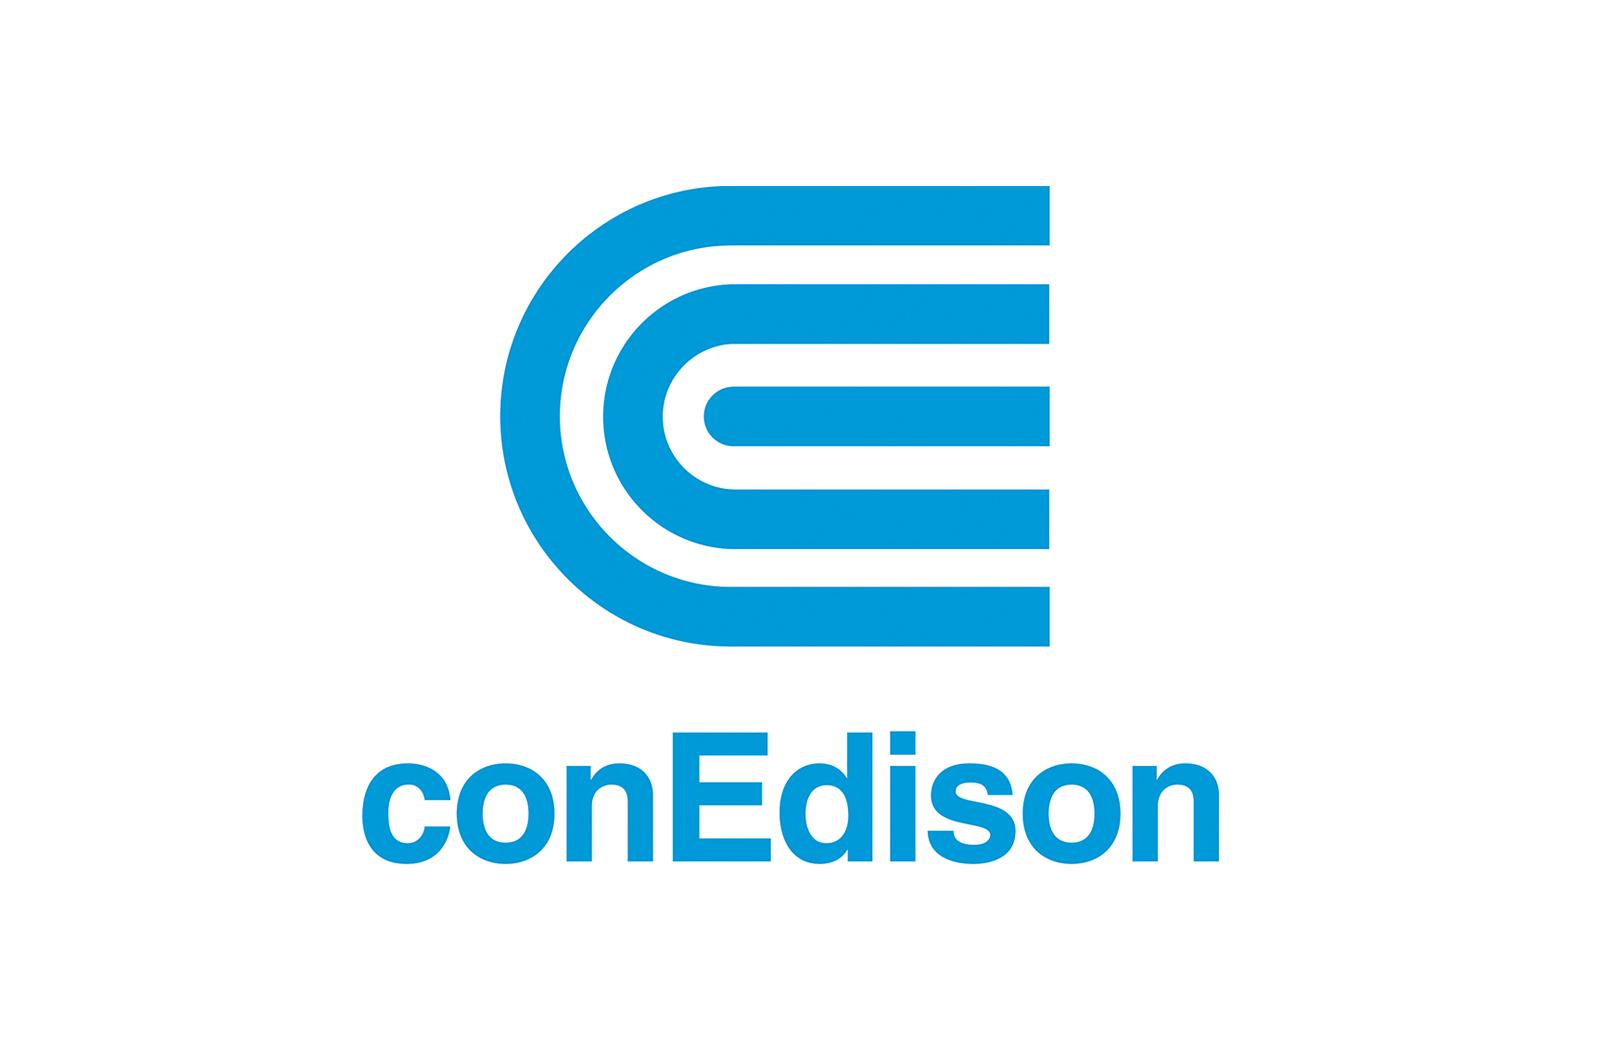 conEdison-logo-designed-by-Arnell-Group.jpg